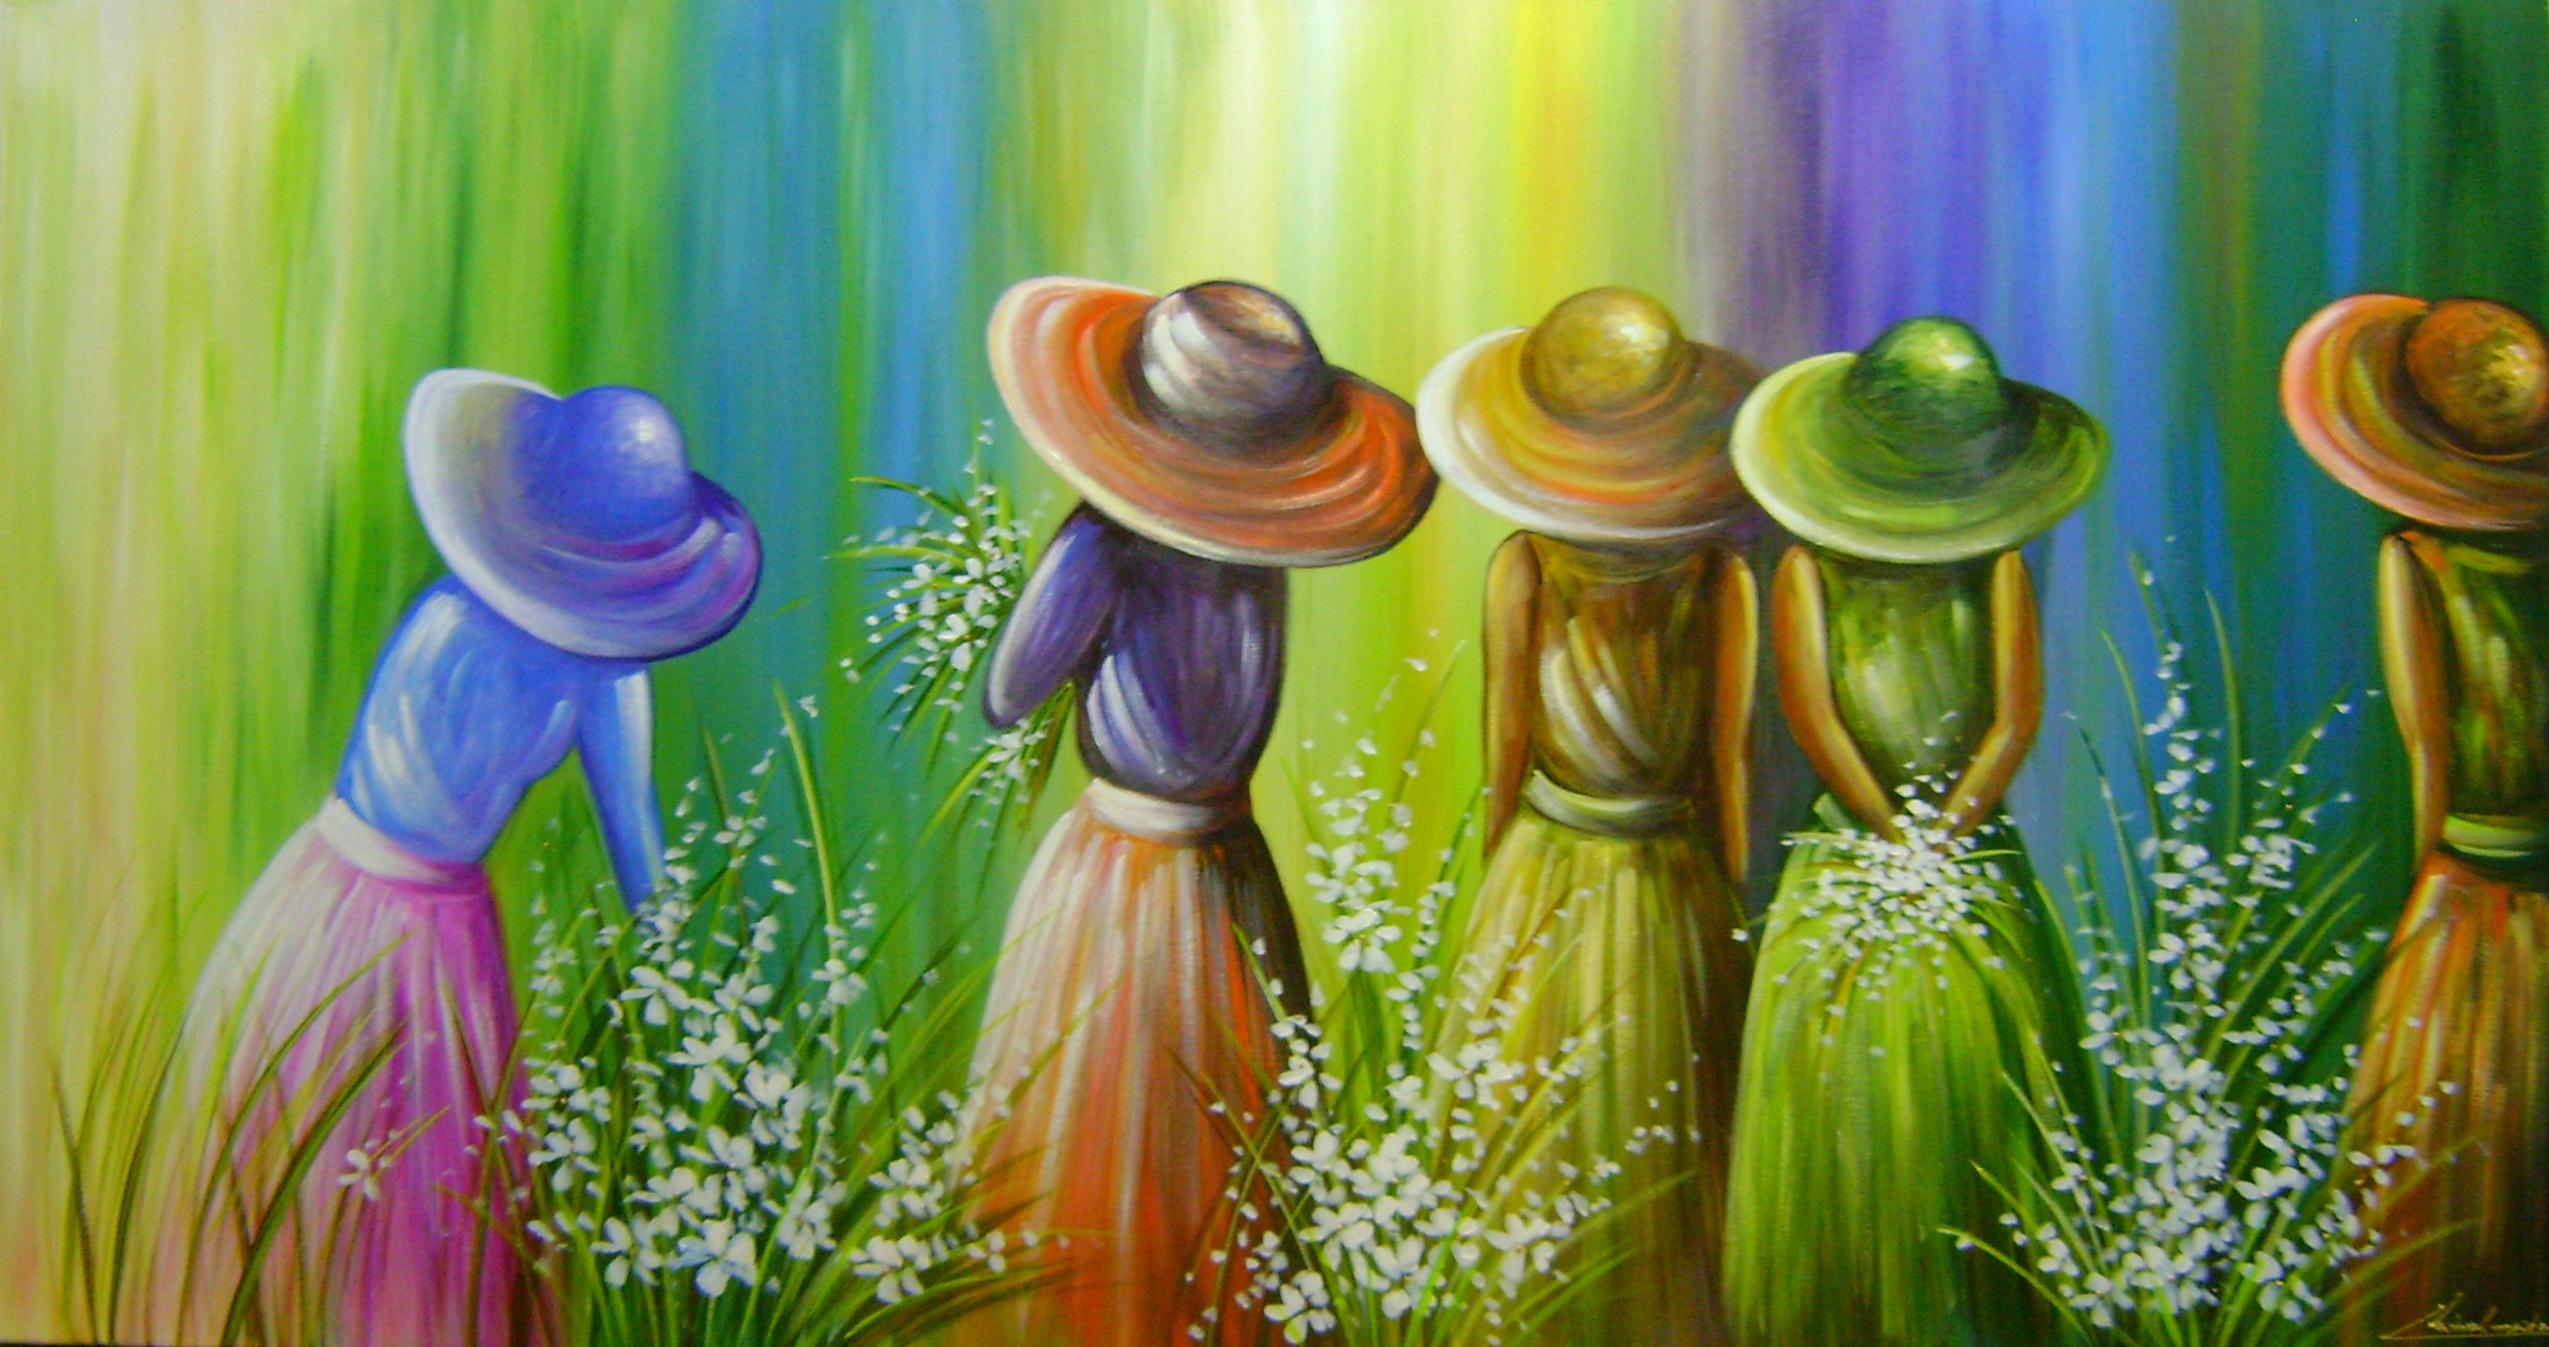 Pintura em tela cod 837 katia almeida pinturas - Pinturas para pintar tela ...